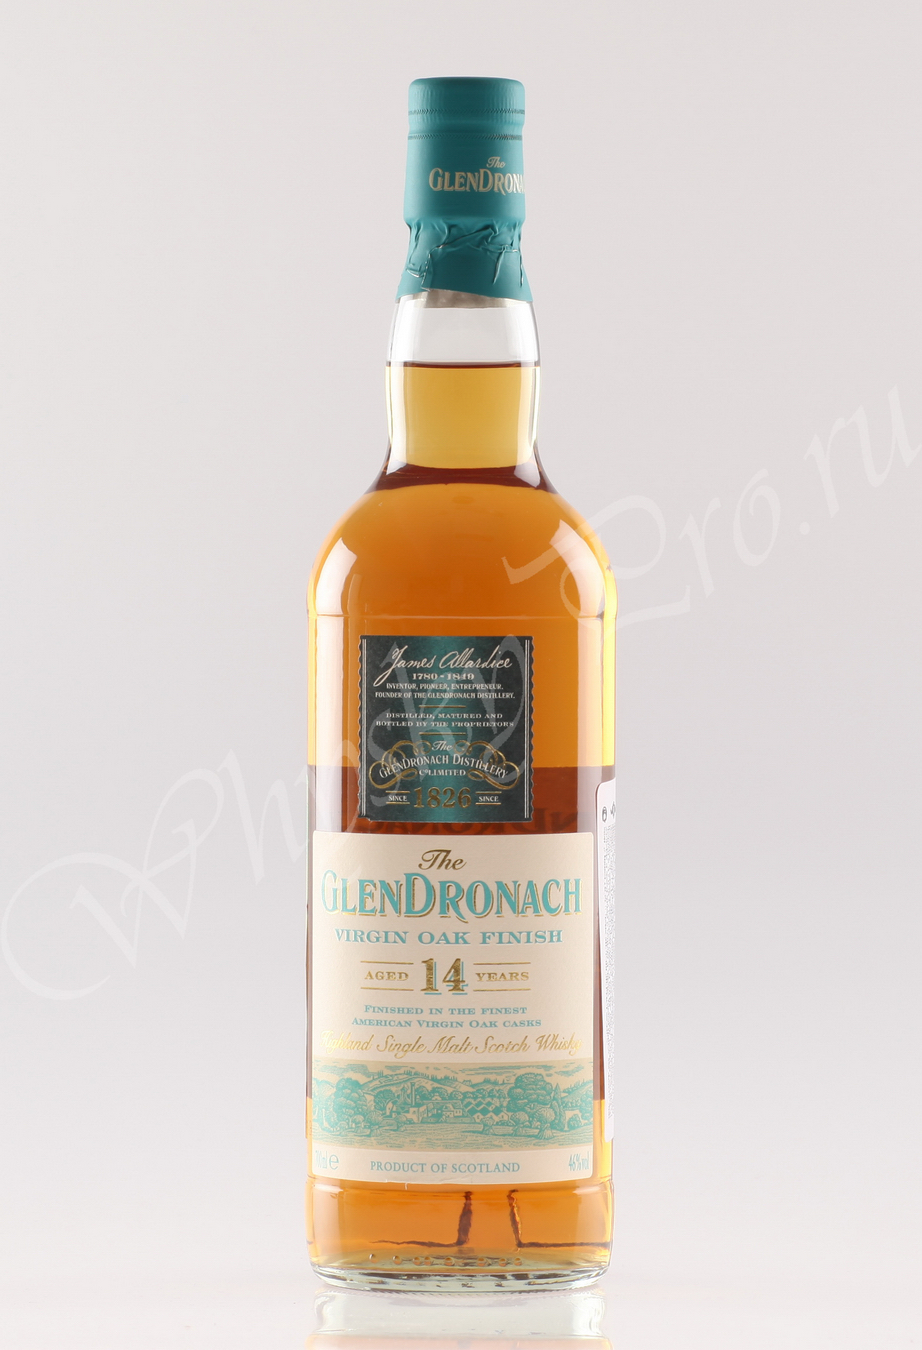 GlenDronach 14 years